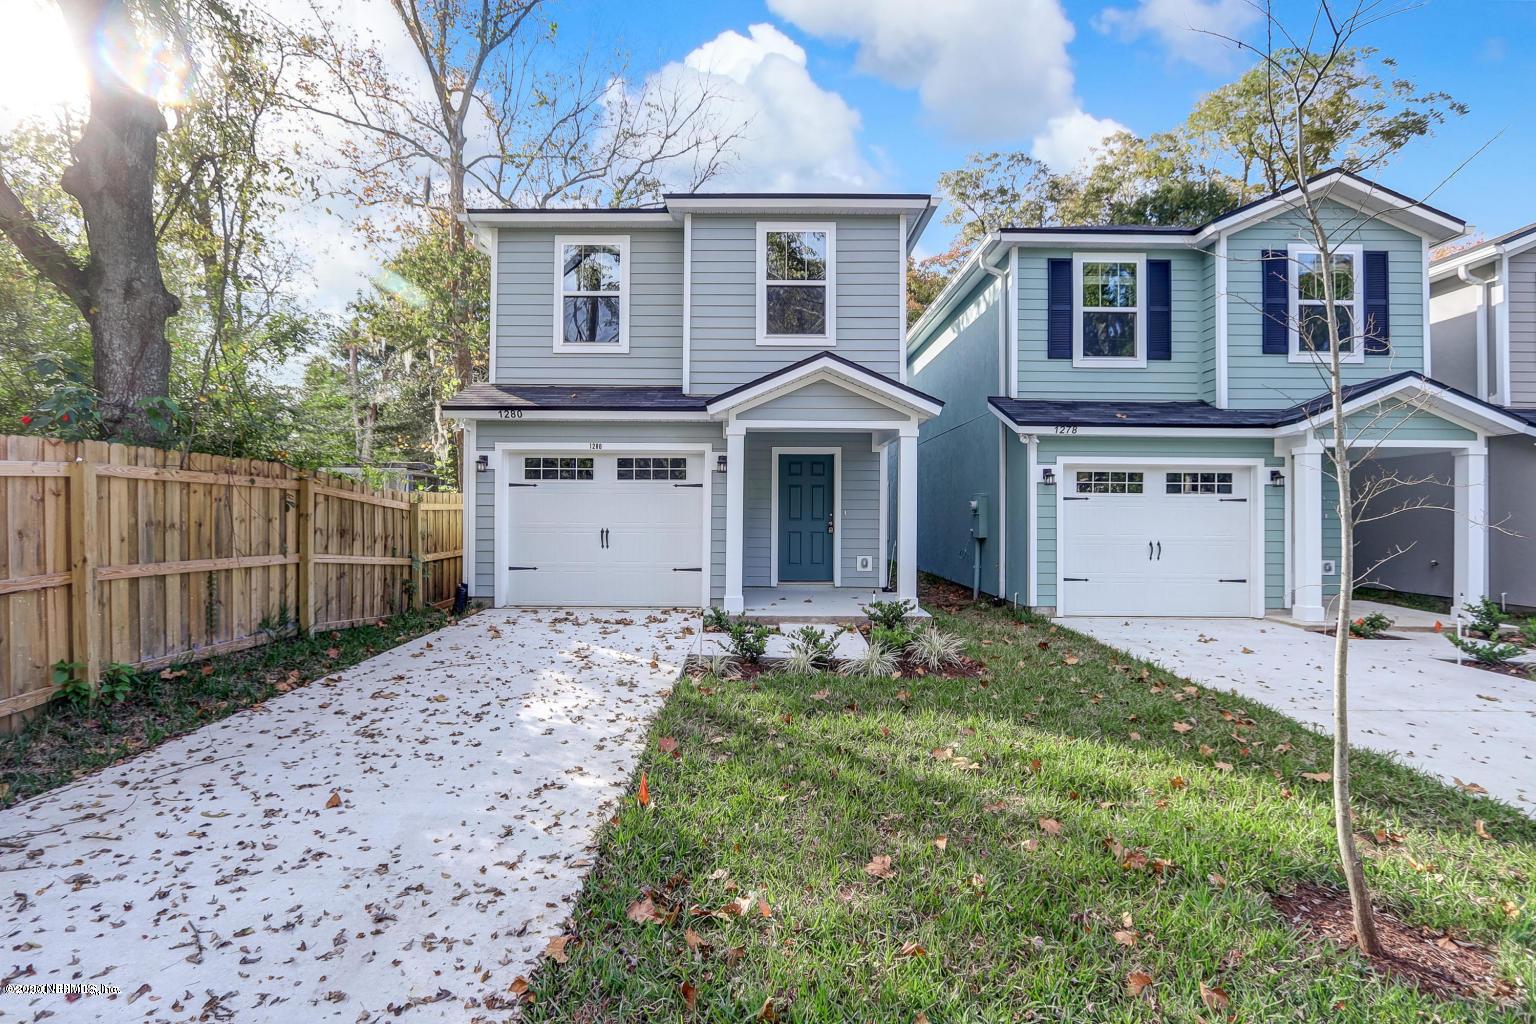 1306 Lake Shore Blvd Jacksonville, FL 32205